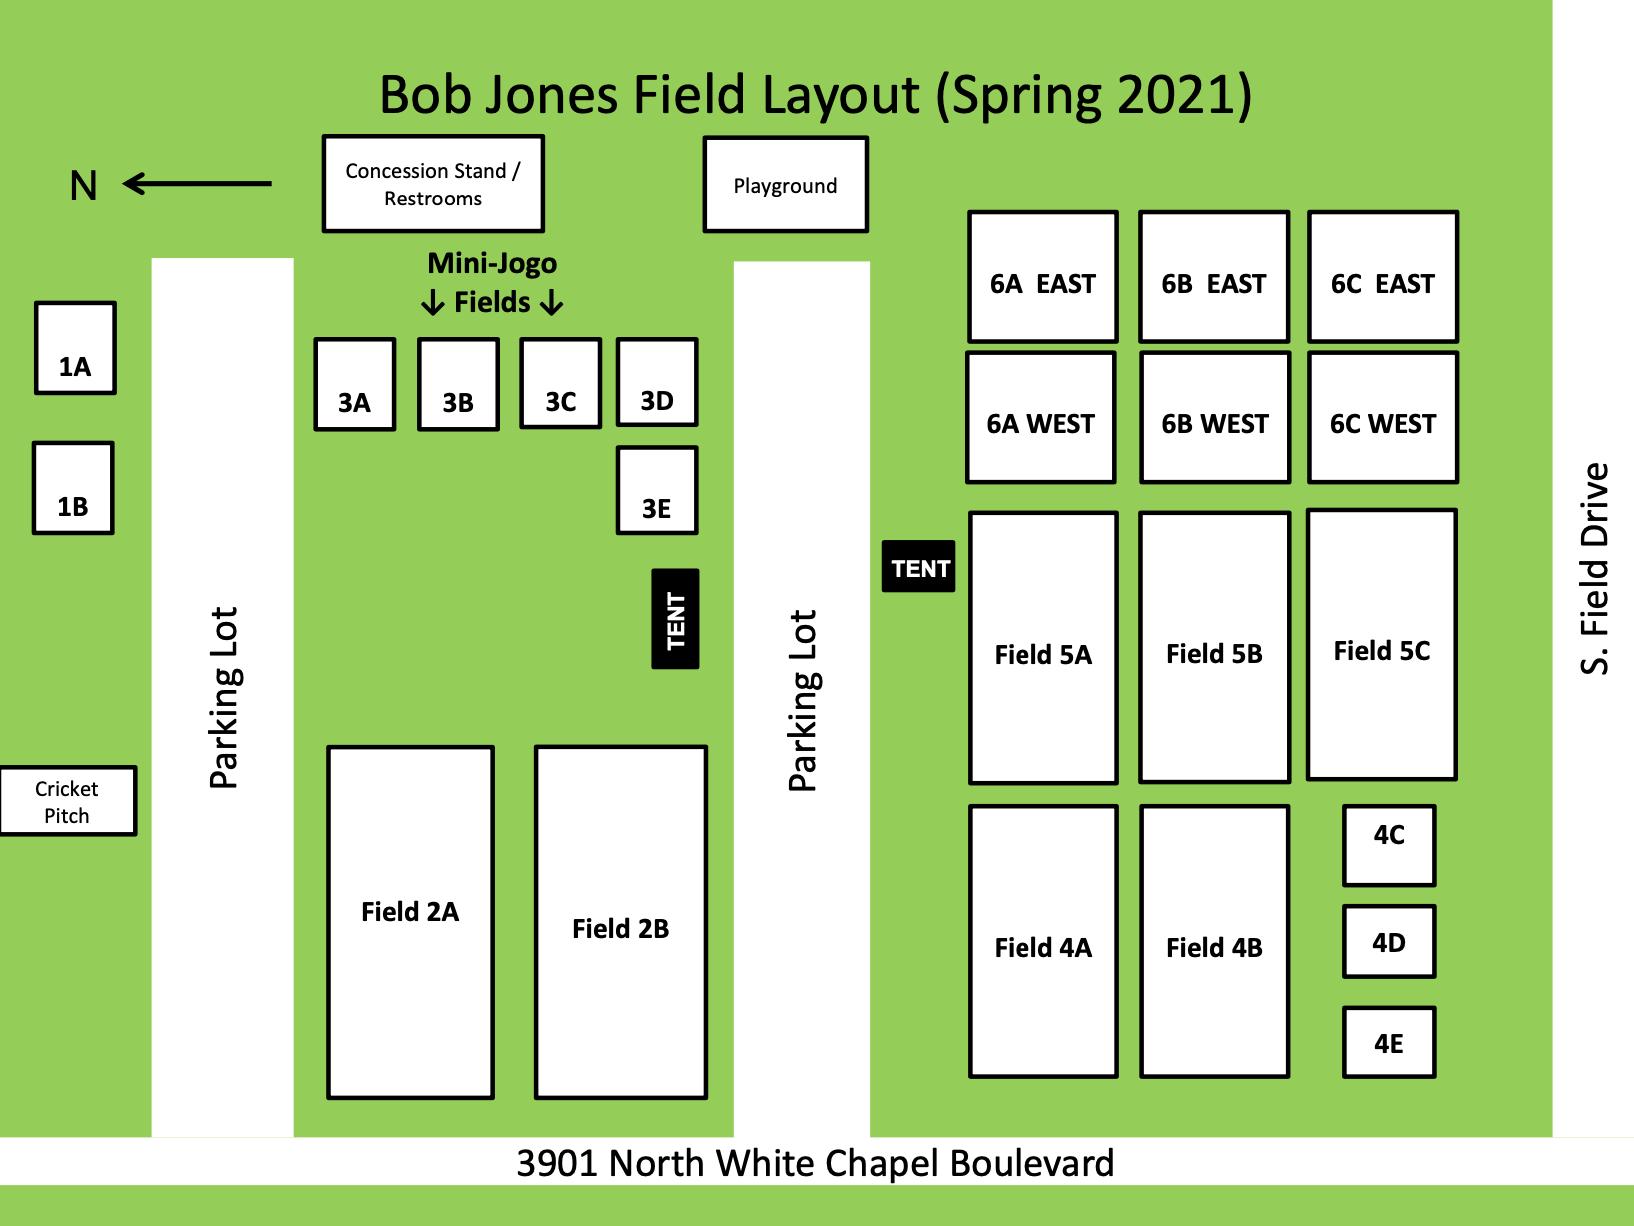 GSSA Bob Jones field layout 2021